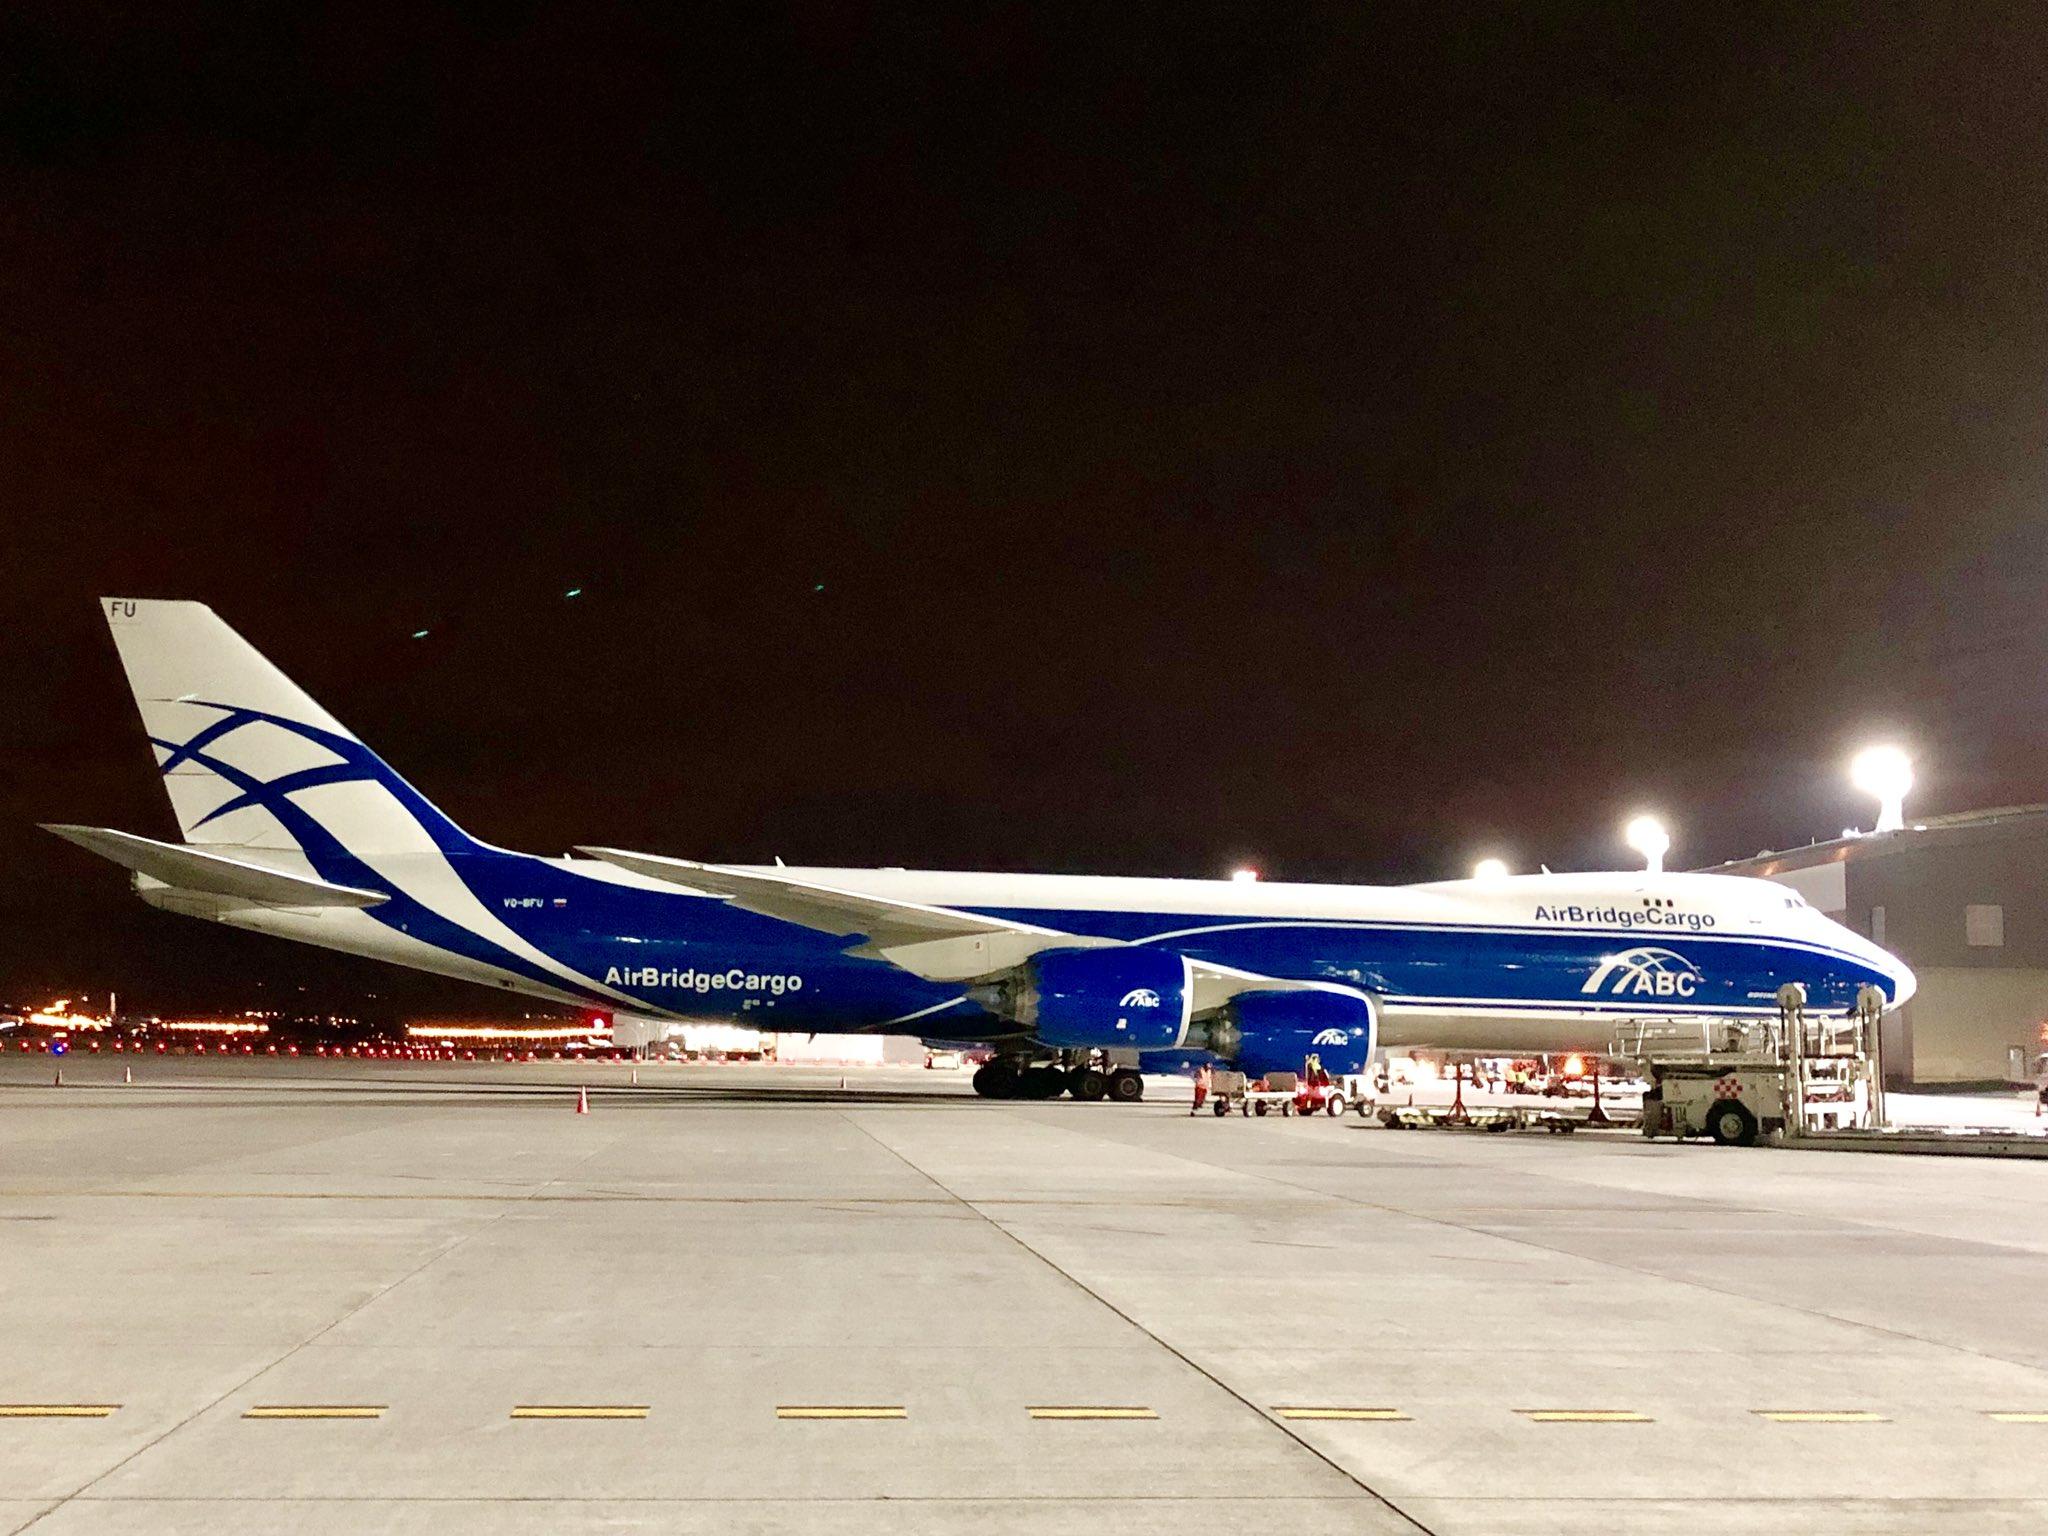 El lindo #B748F de #AirBrigeCargo ayer en el @AeropuertoUIO @n_larenas @EcuAvPhoto @JuankVillagomez @avgeekofficial @AviacionGYE @AvEcuadorRT @andrelarenasf @Diogo_NMS @iccparla https://t.co/NrWvFNULG8